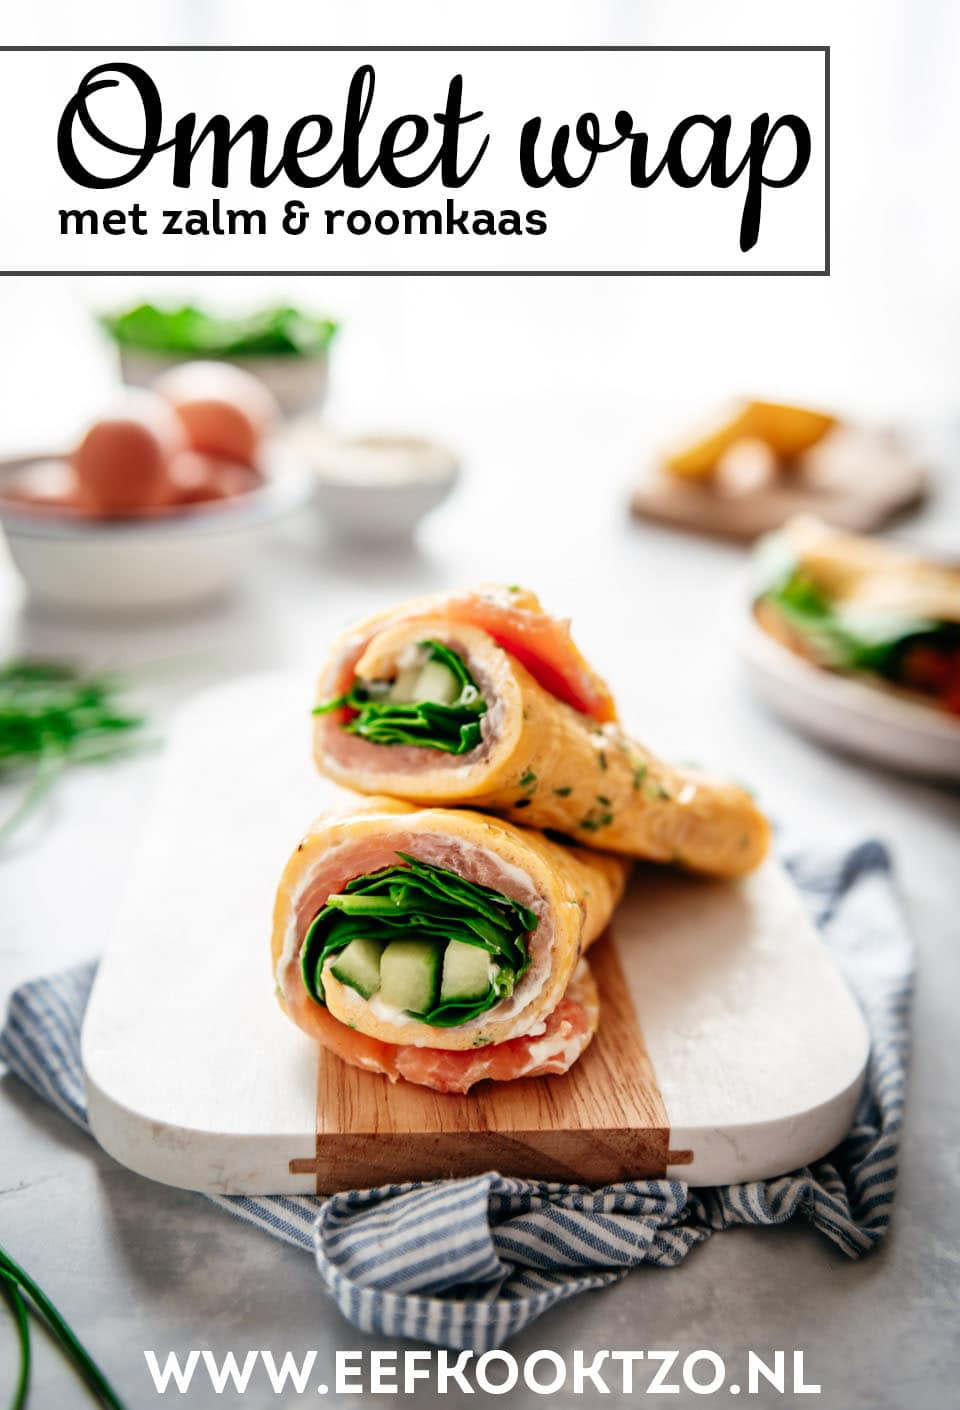 Omelet wrap met zalm Pinterest Collage